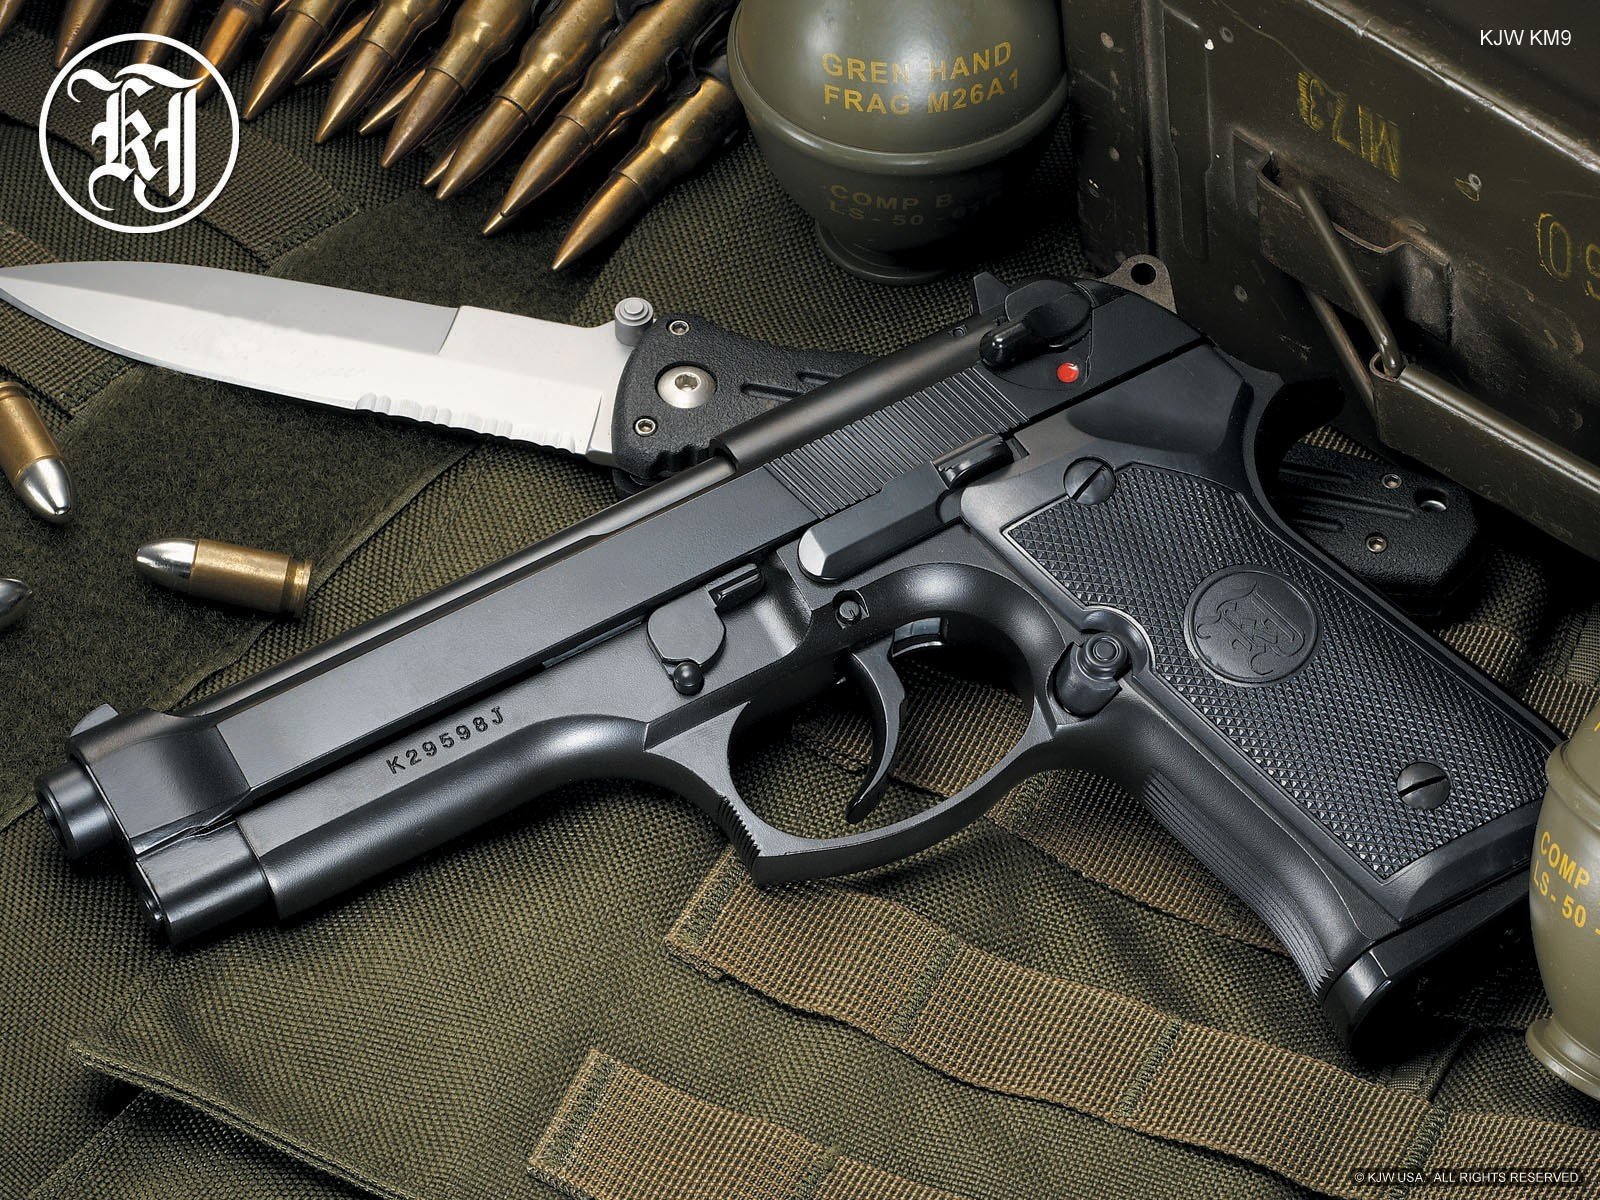 Pistols Guns Wallpaper 1600x1200 Pistols Guns Weapons Knives 1600x1200